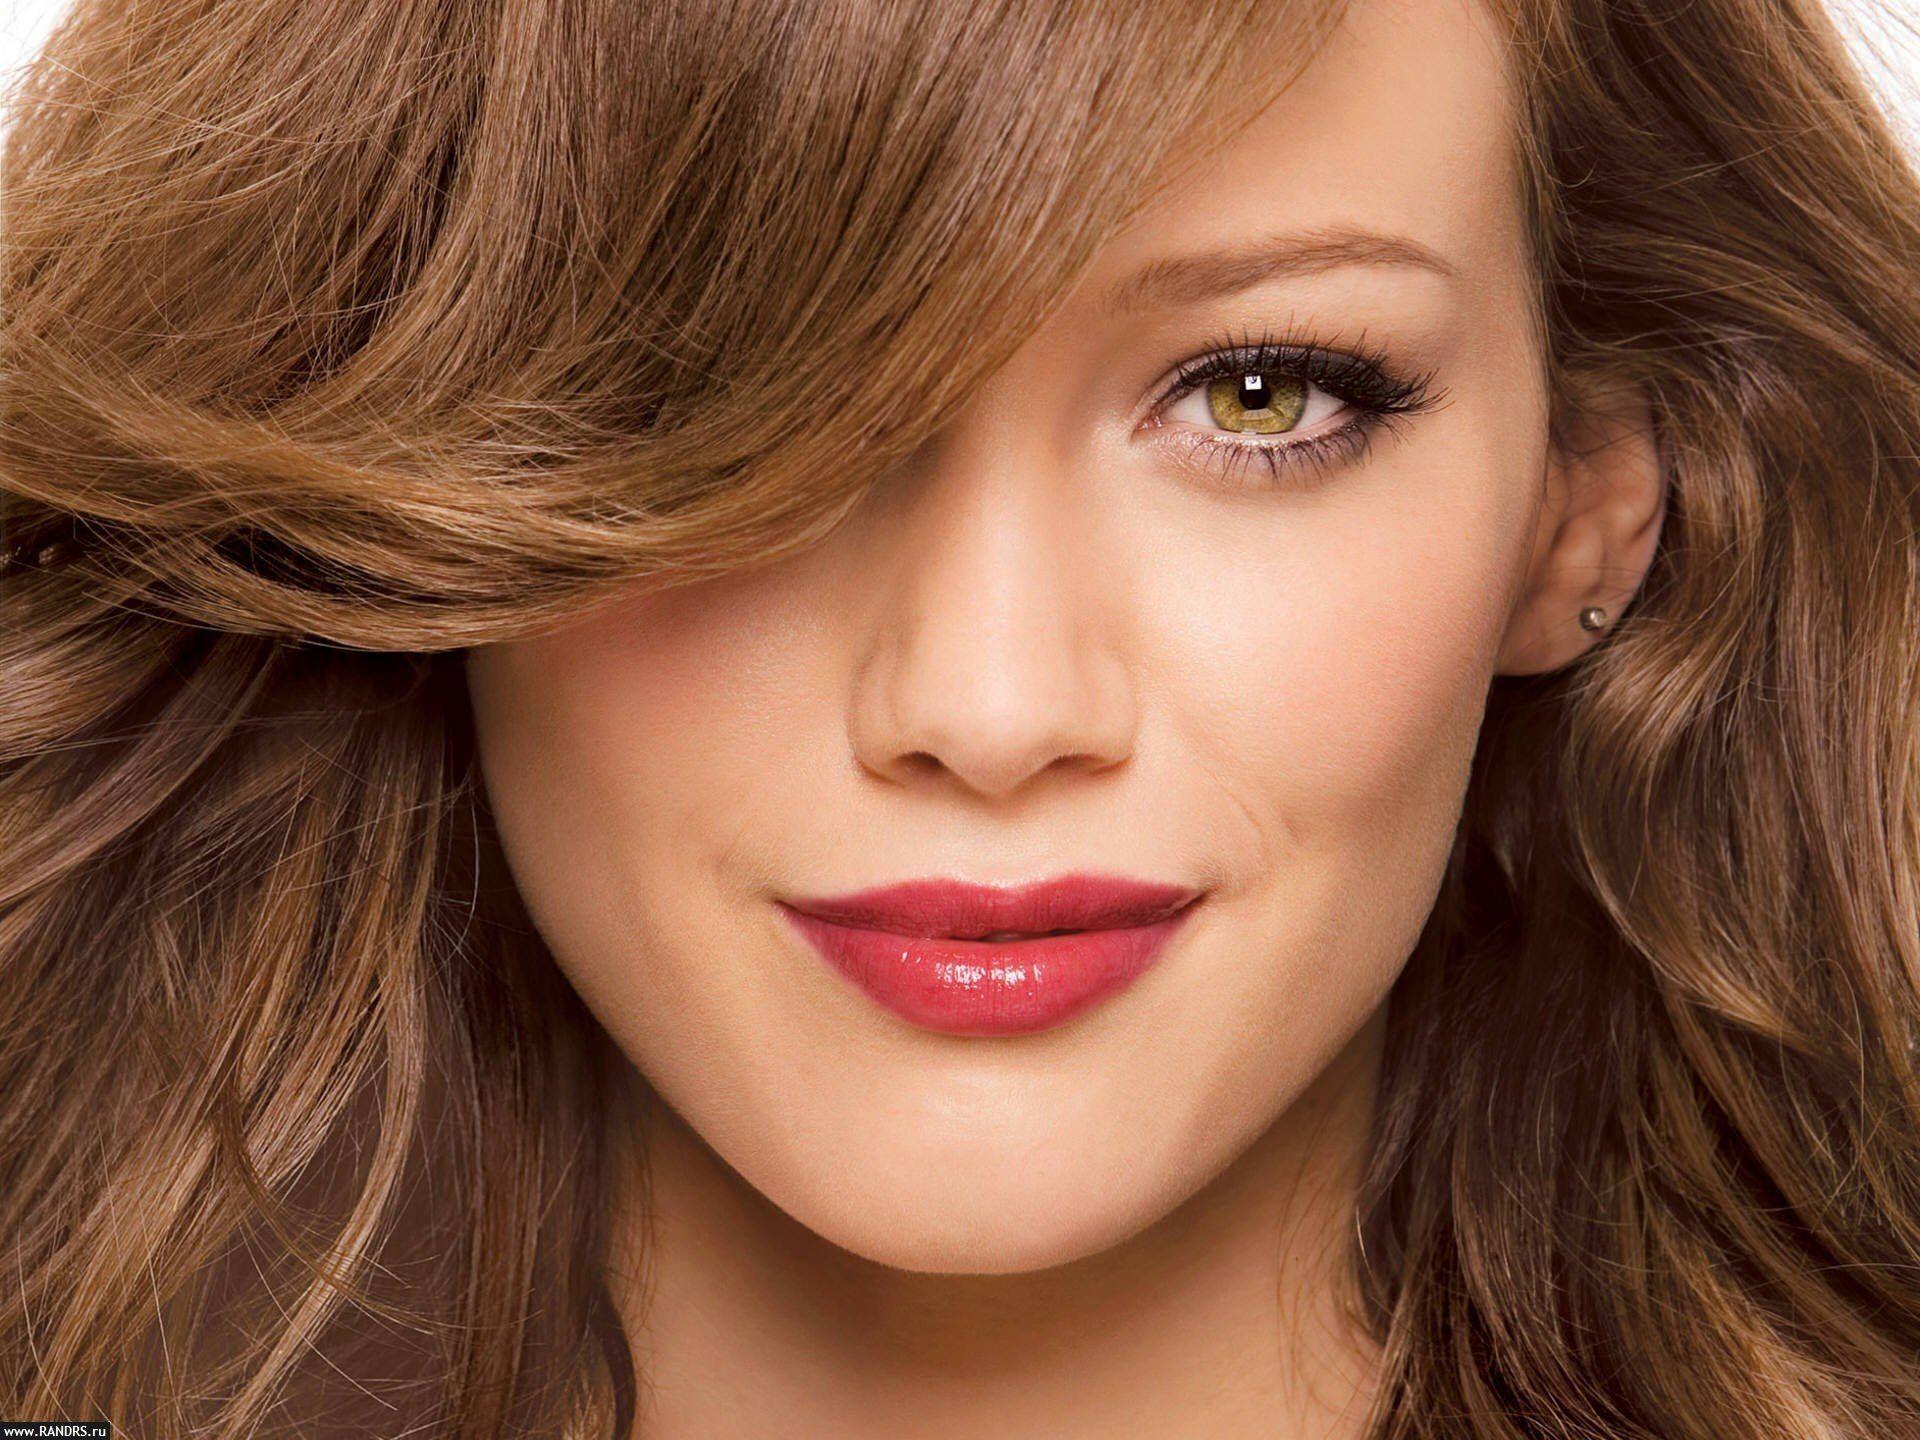 Amazing Set of Beautiful Women Faces HD Wallpapers Set – 2 .